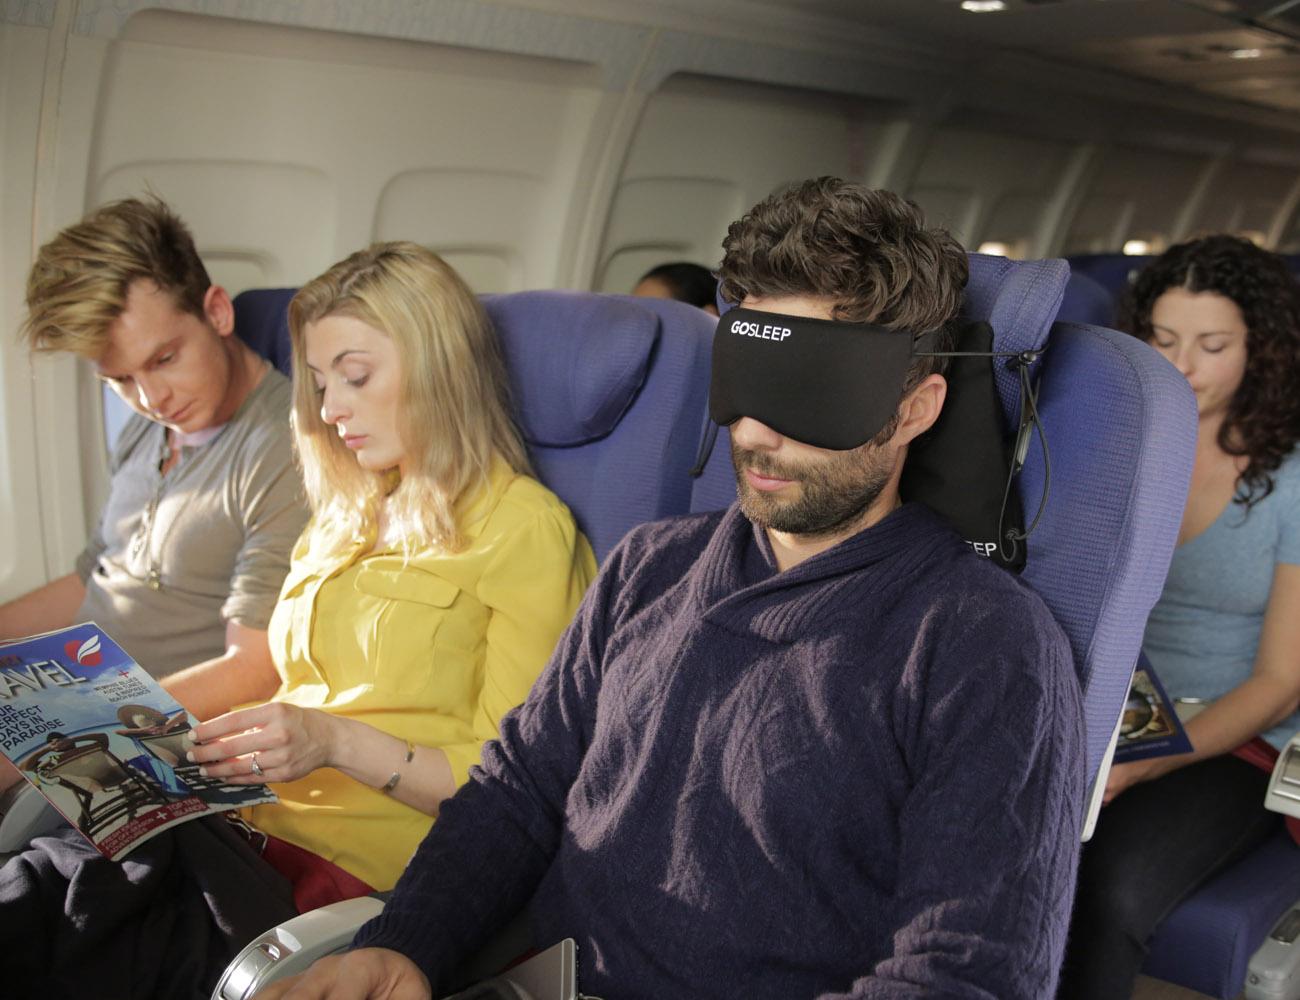 GOSLEEP 2-in-1 Travel Pillow Set